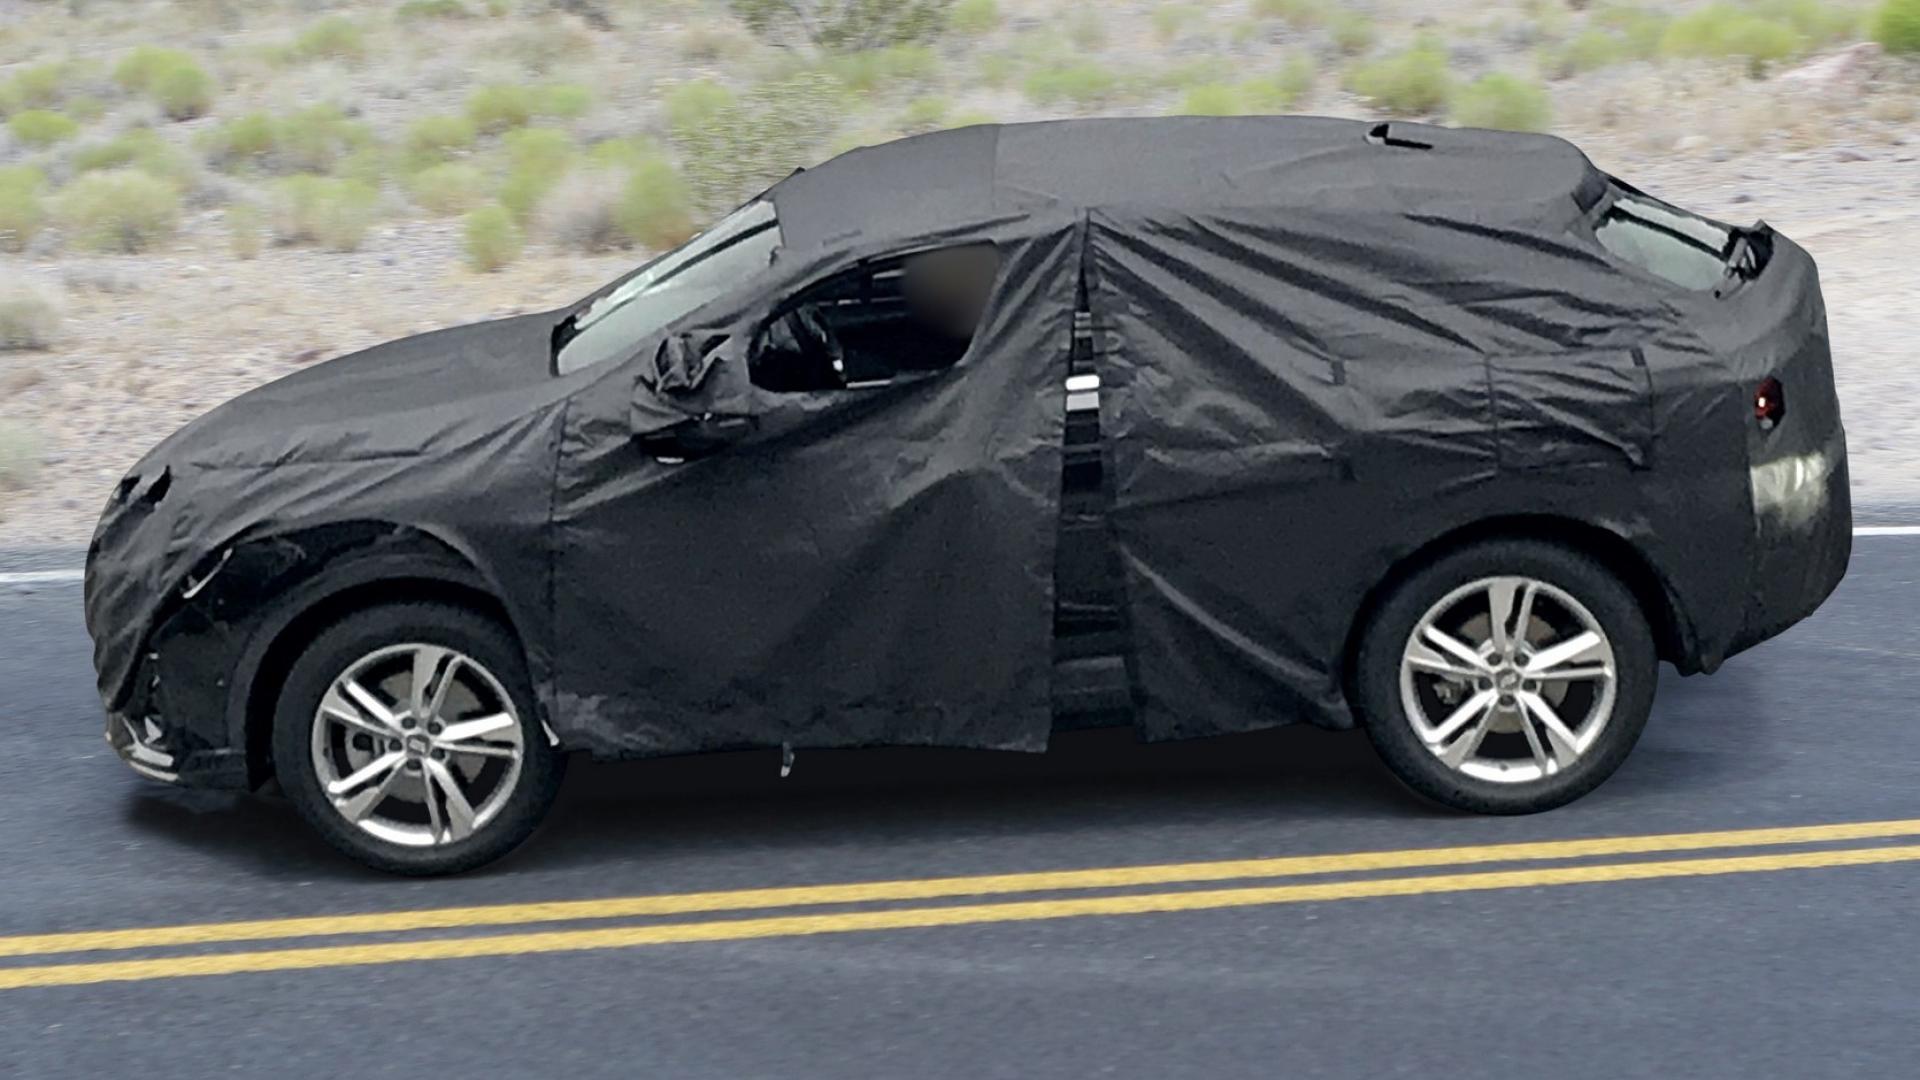 2020 Audi Q4 spy